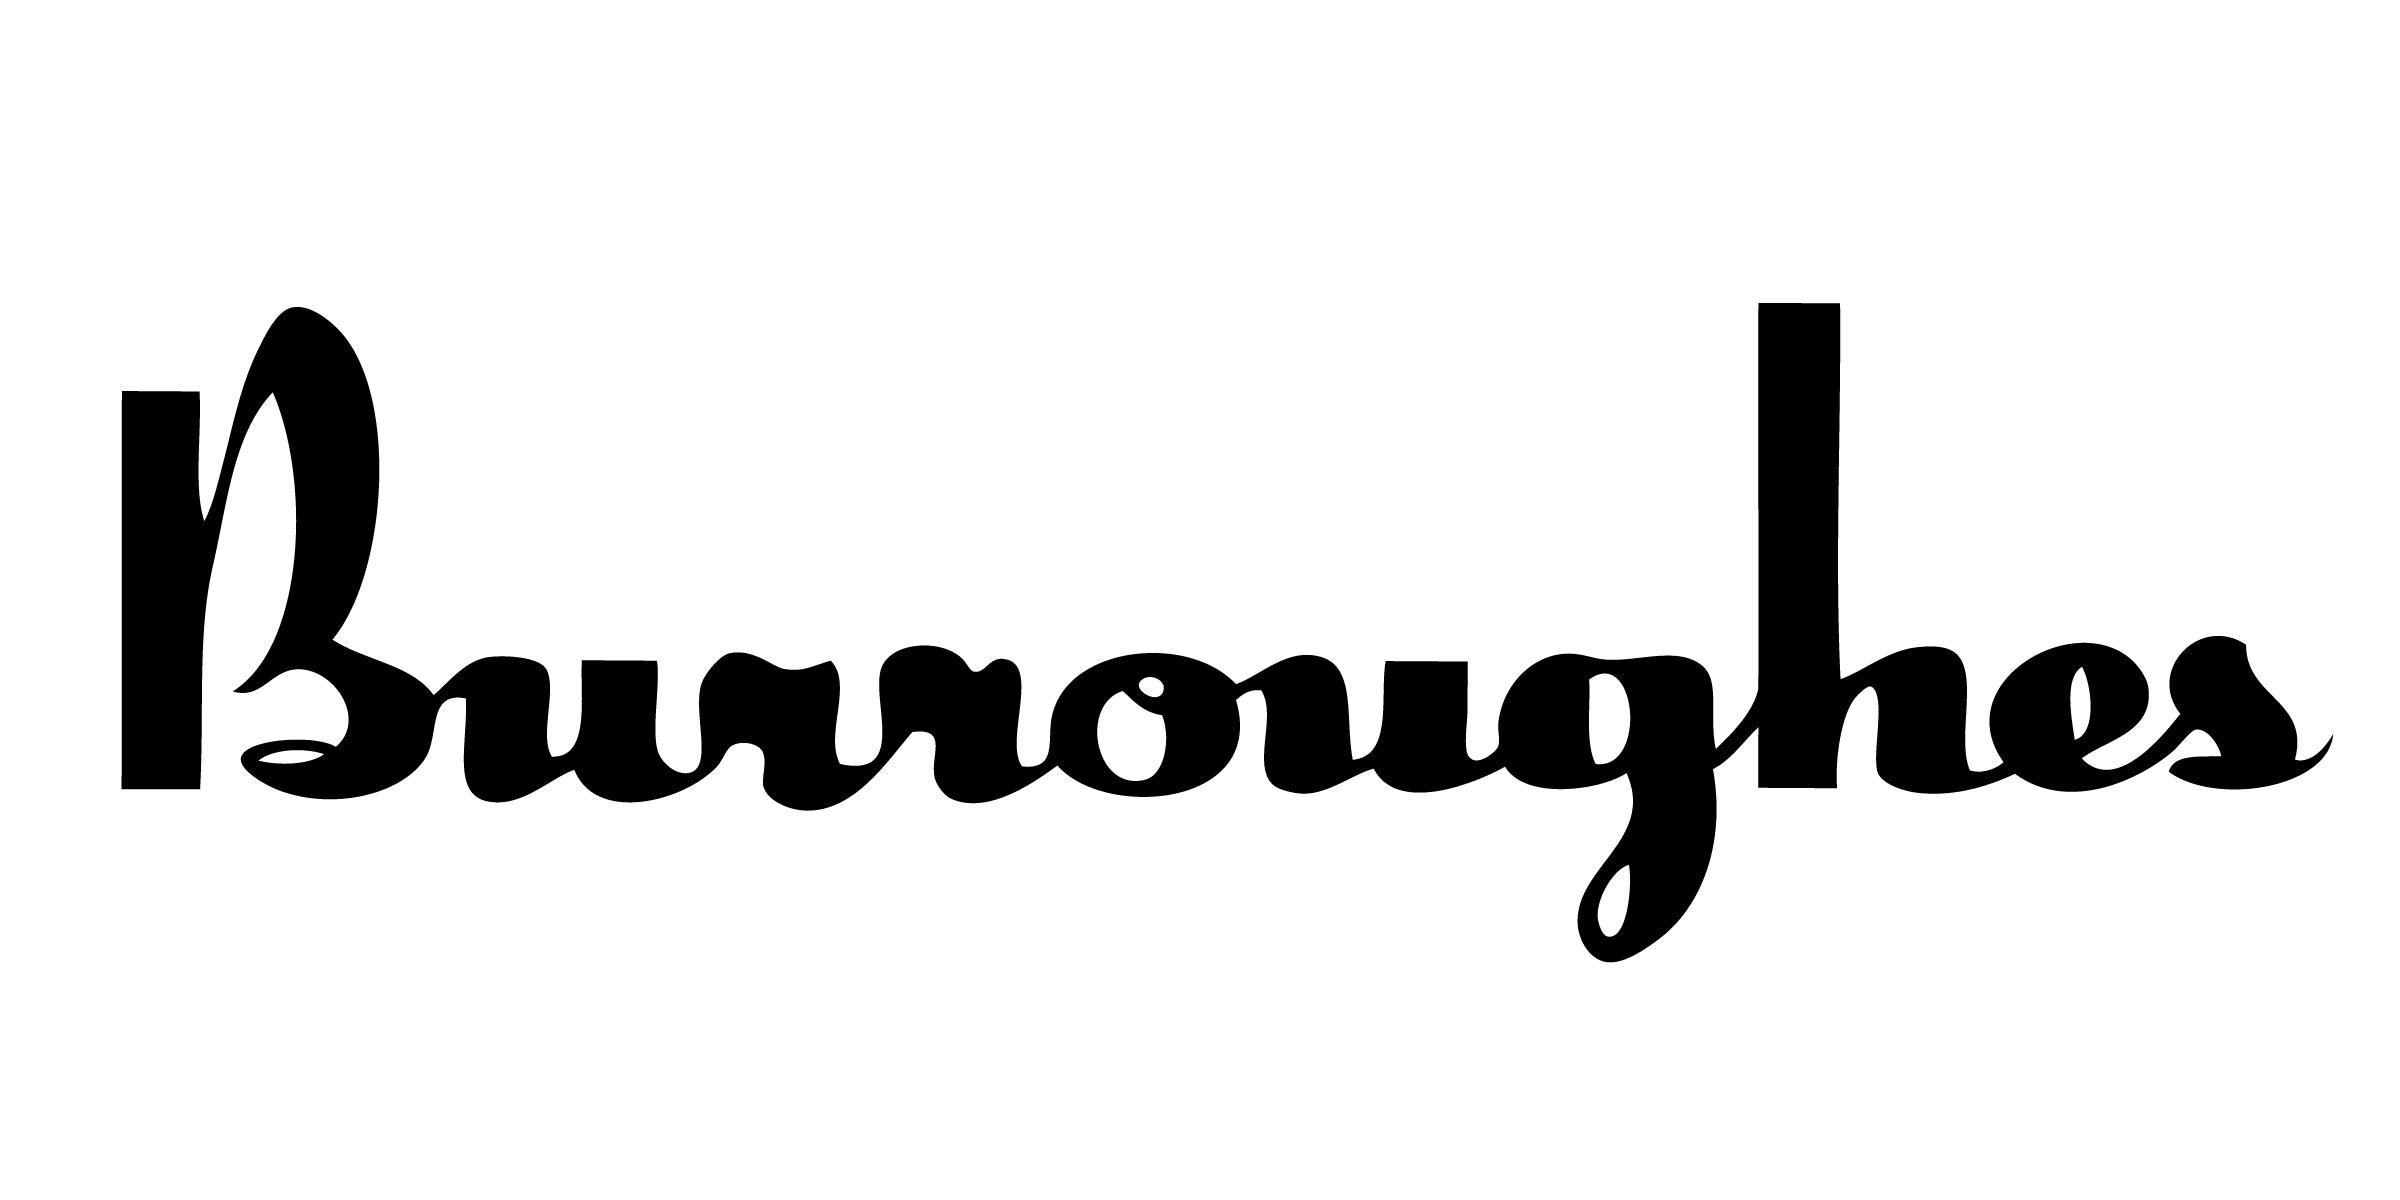 burroughes logo.jpg